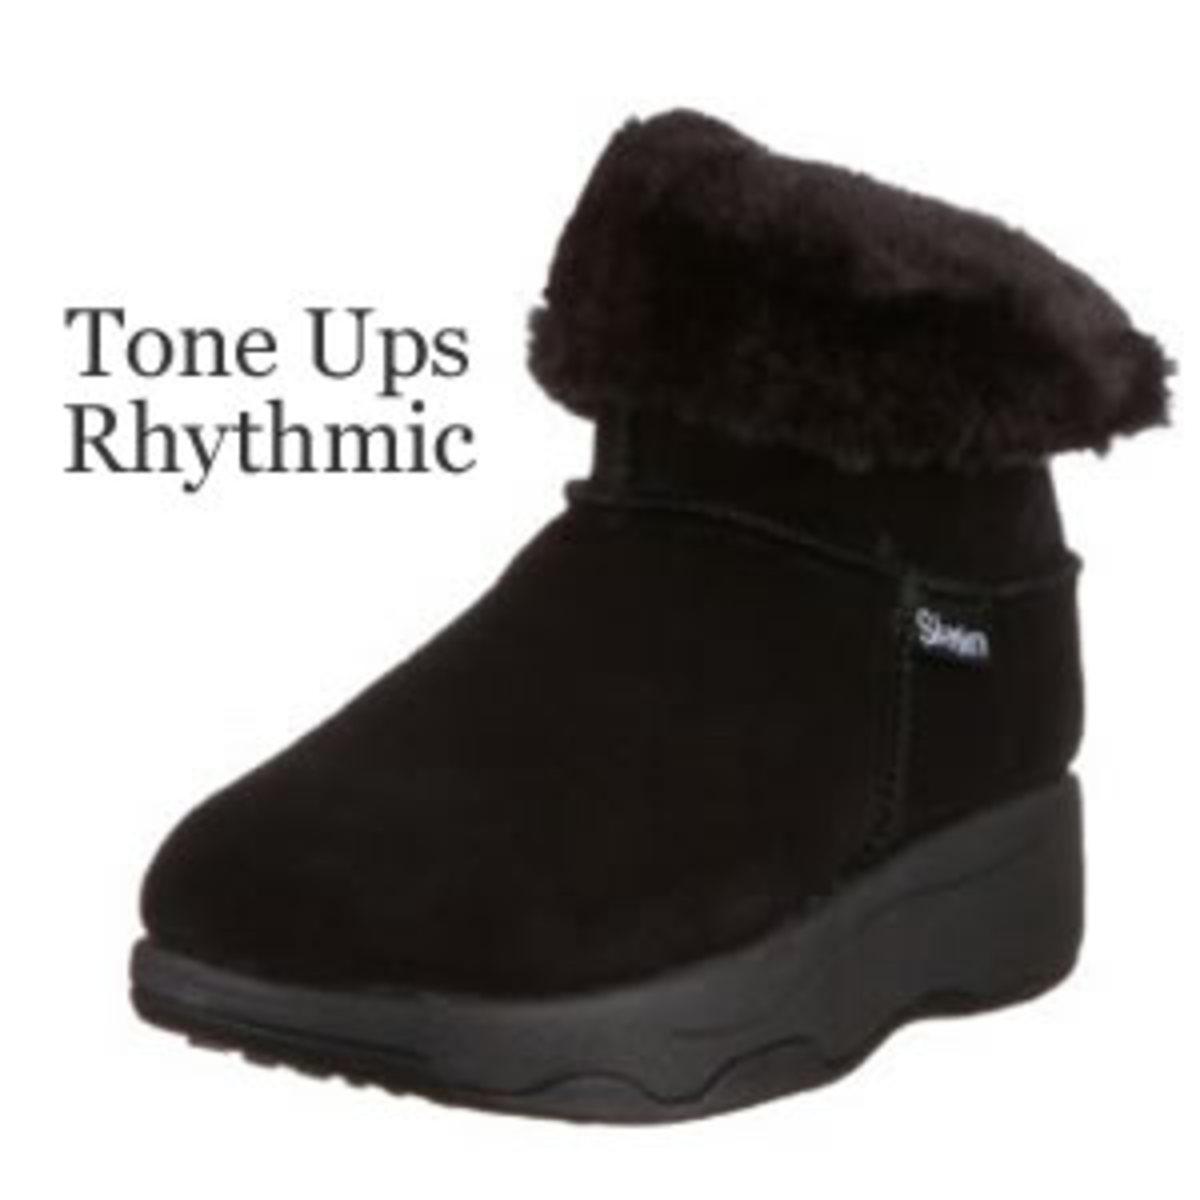 Skechers Tone Ups Rhythmic Boots